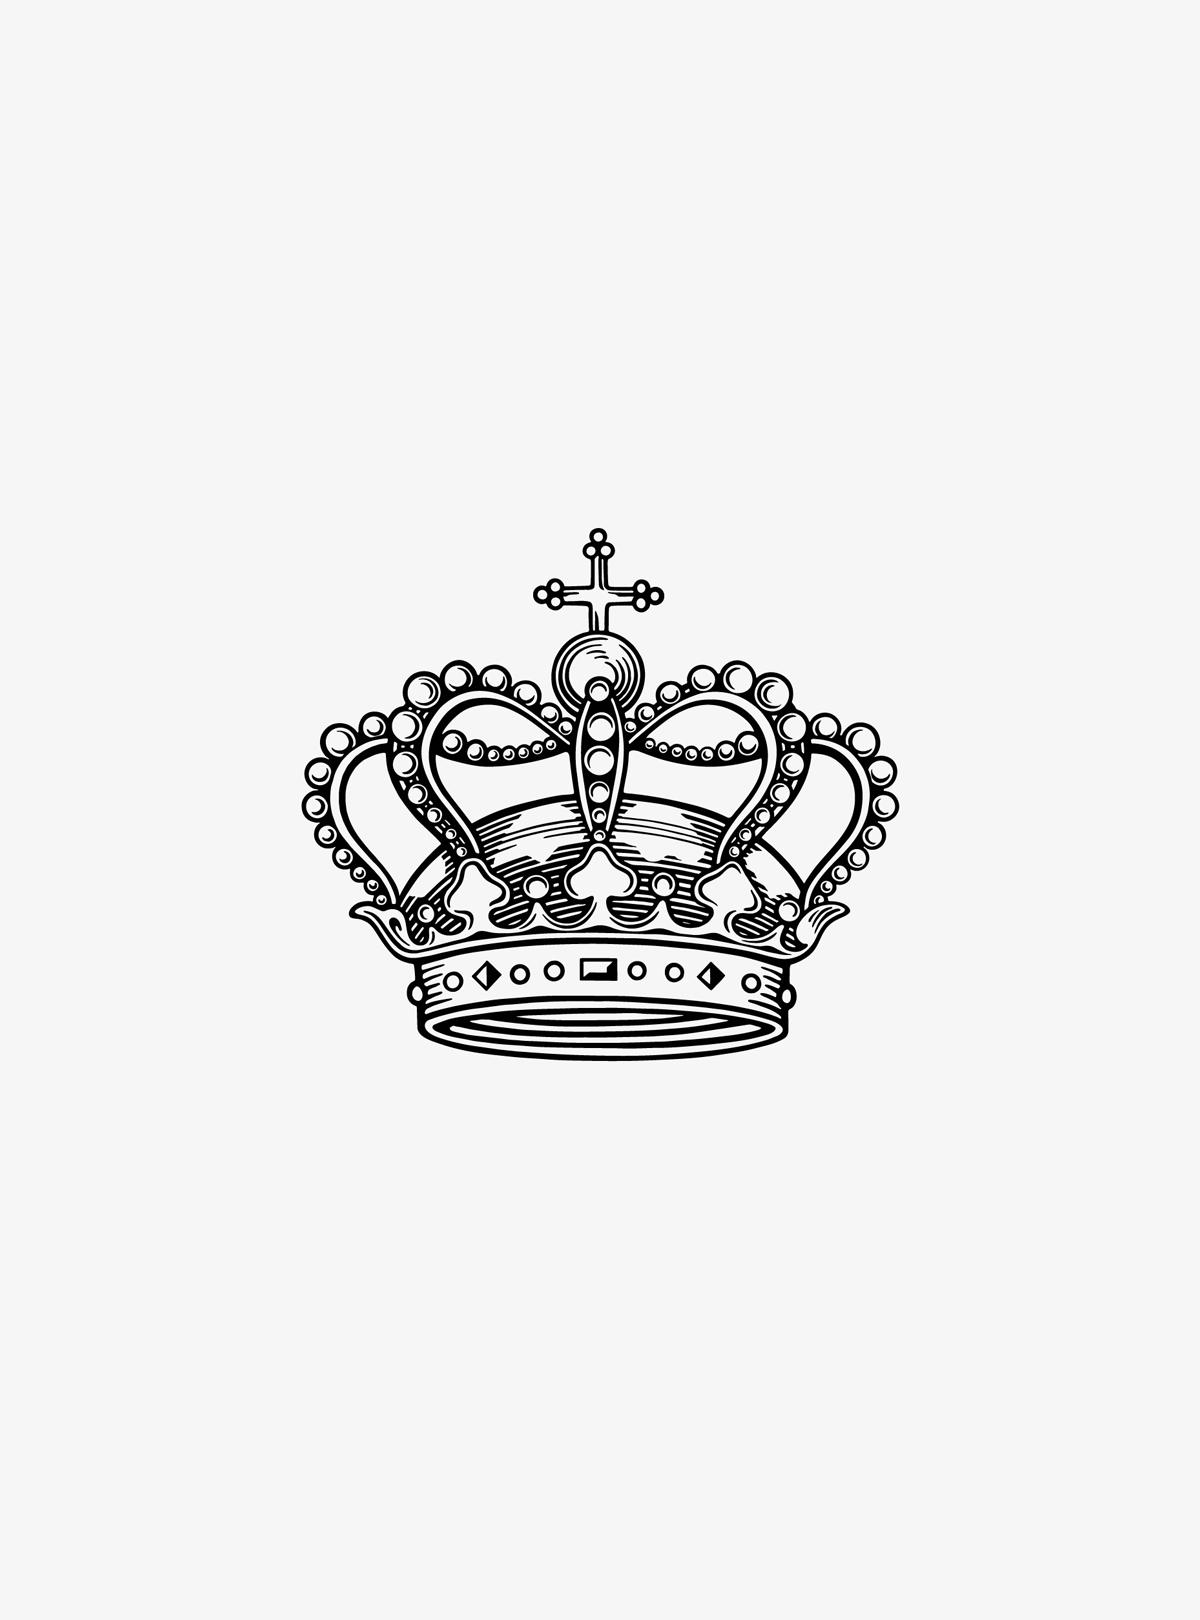 GJ_crown.jpg